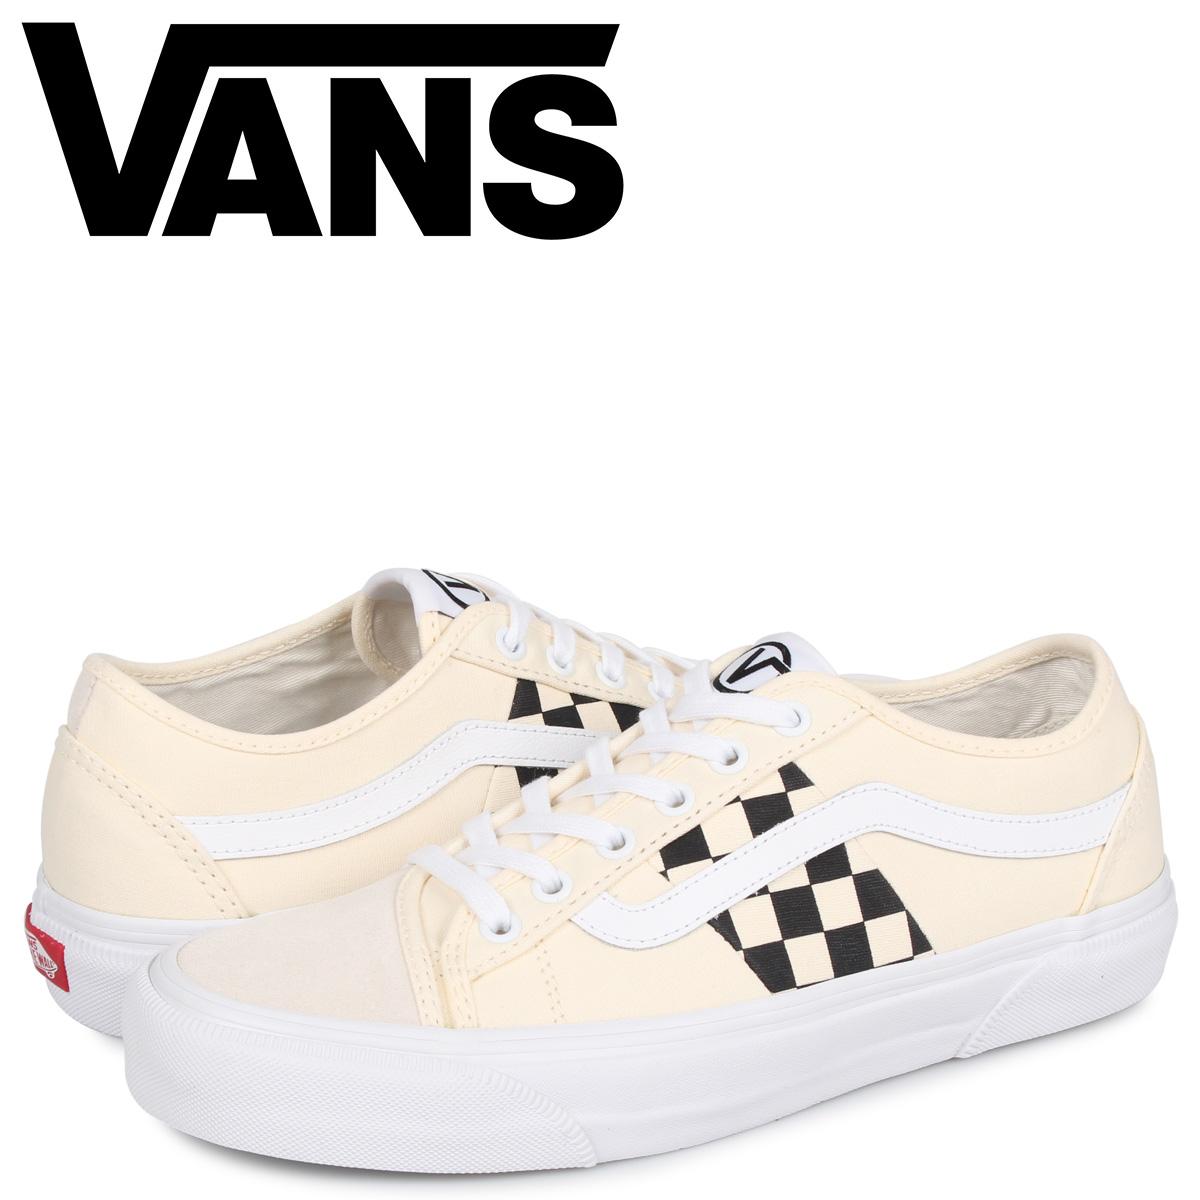 VANS バンズ BESS NI スニーカー メンズ ヴァンズ ベス ホワイト 白 VN0A4BTHT80